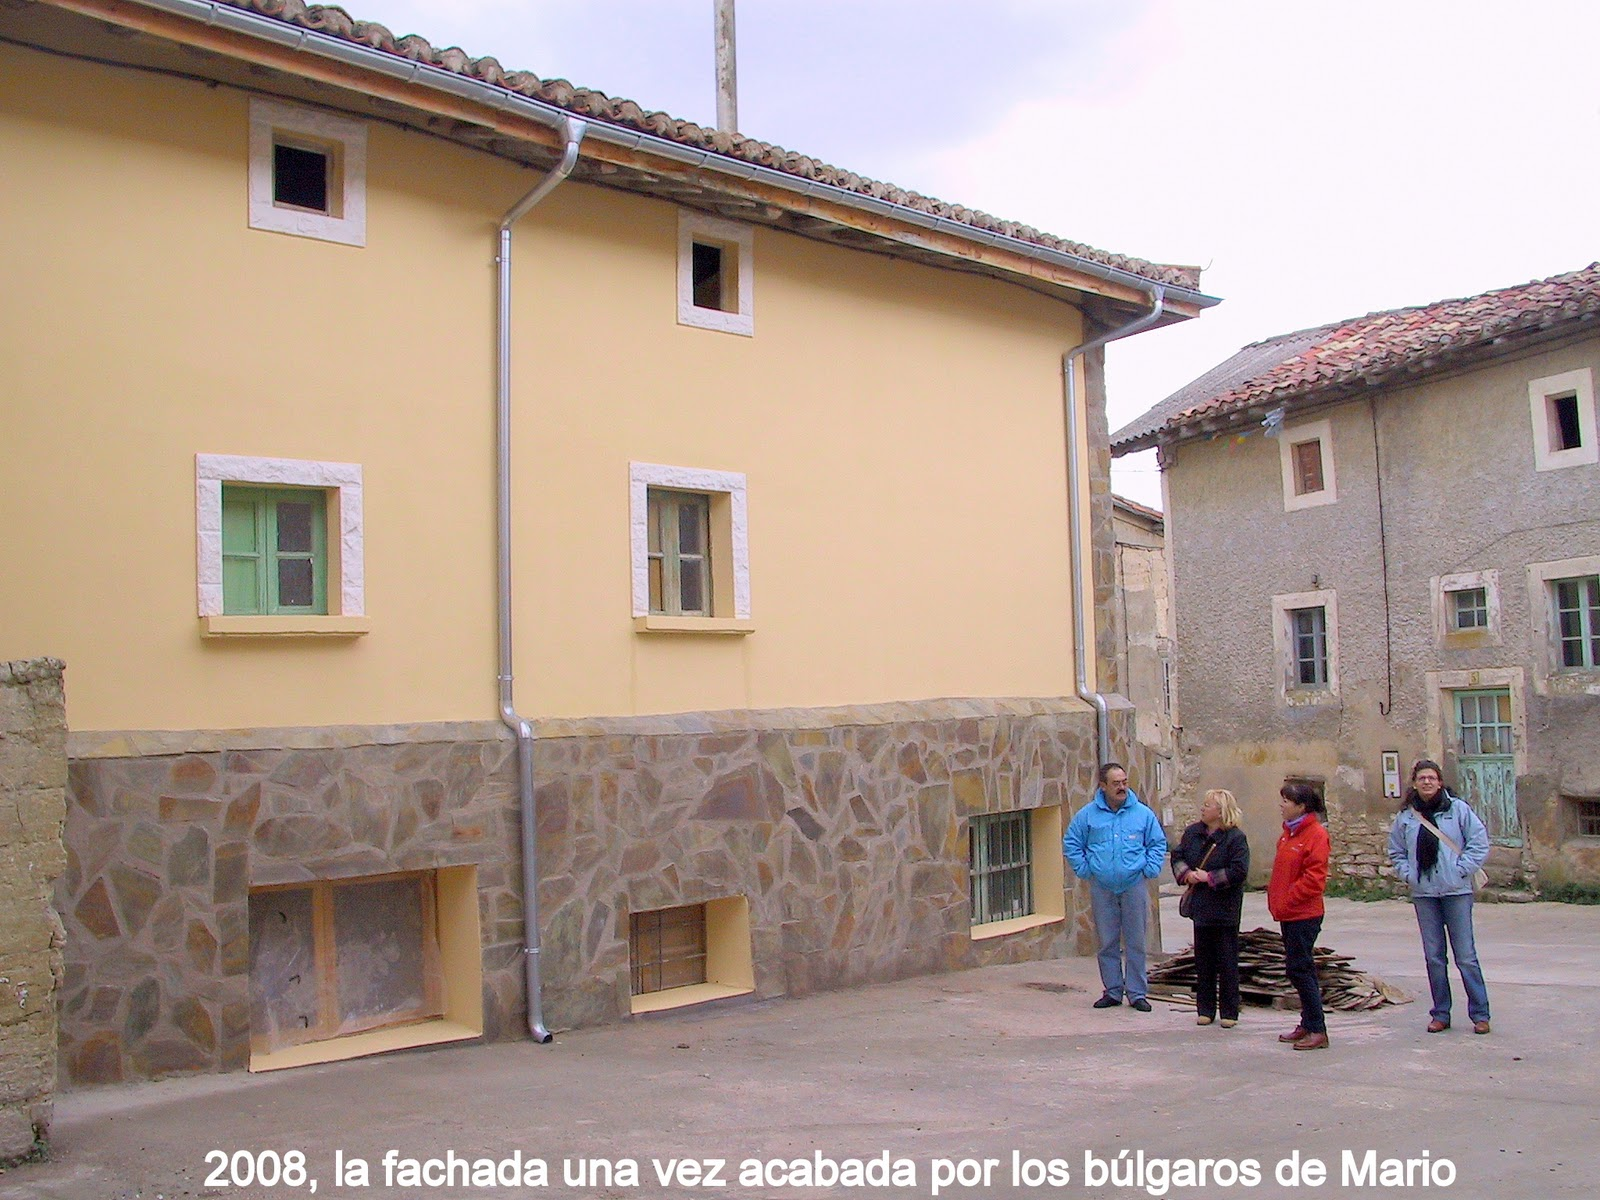 Quintanaloranco rehabilitaci n casa - Rehabilitacion casas antiguas ...